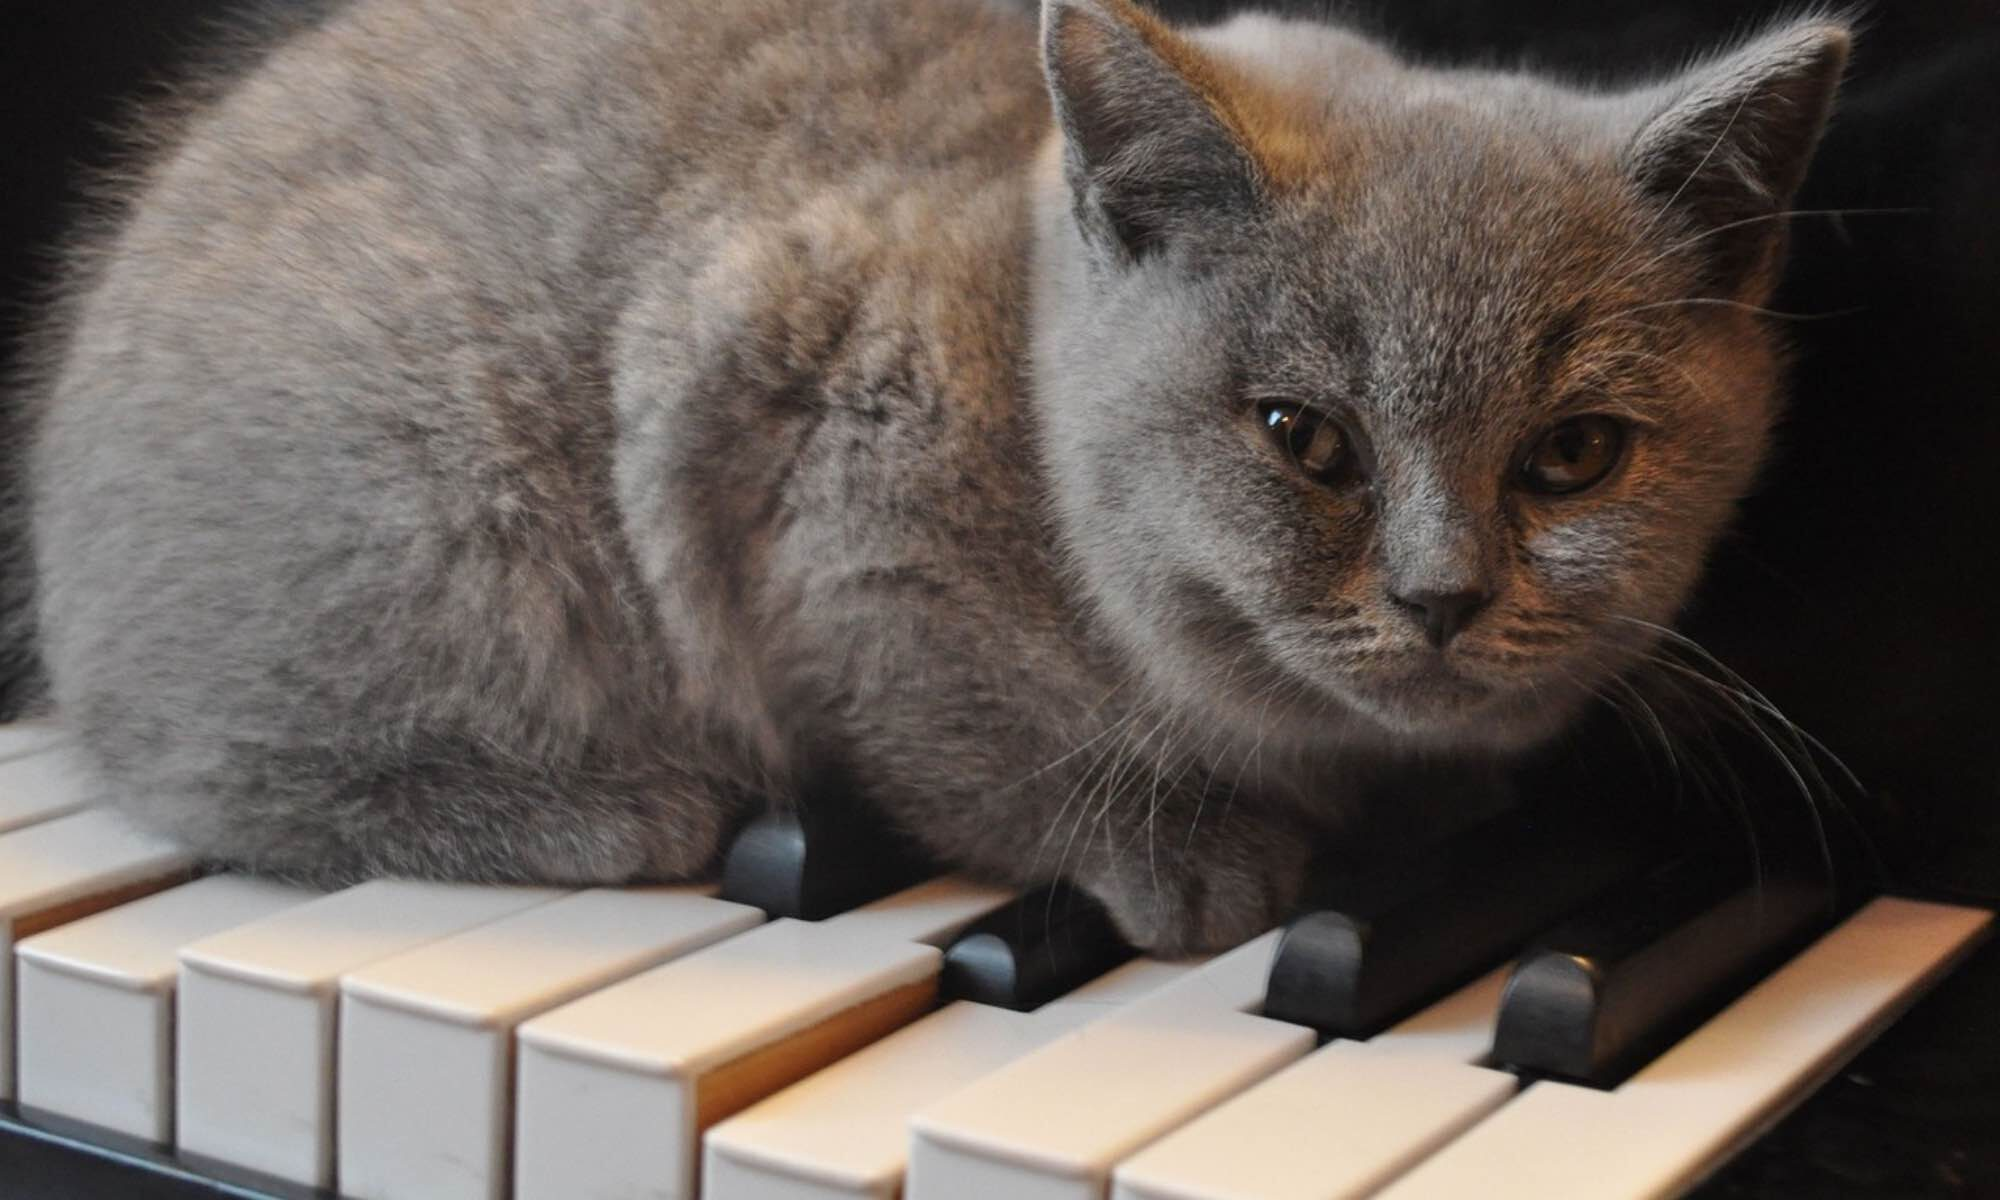 Pianostemmer Leon Rombouts